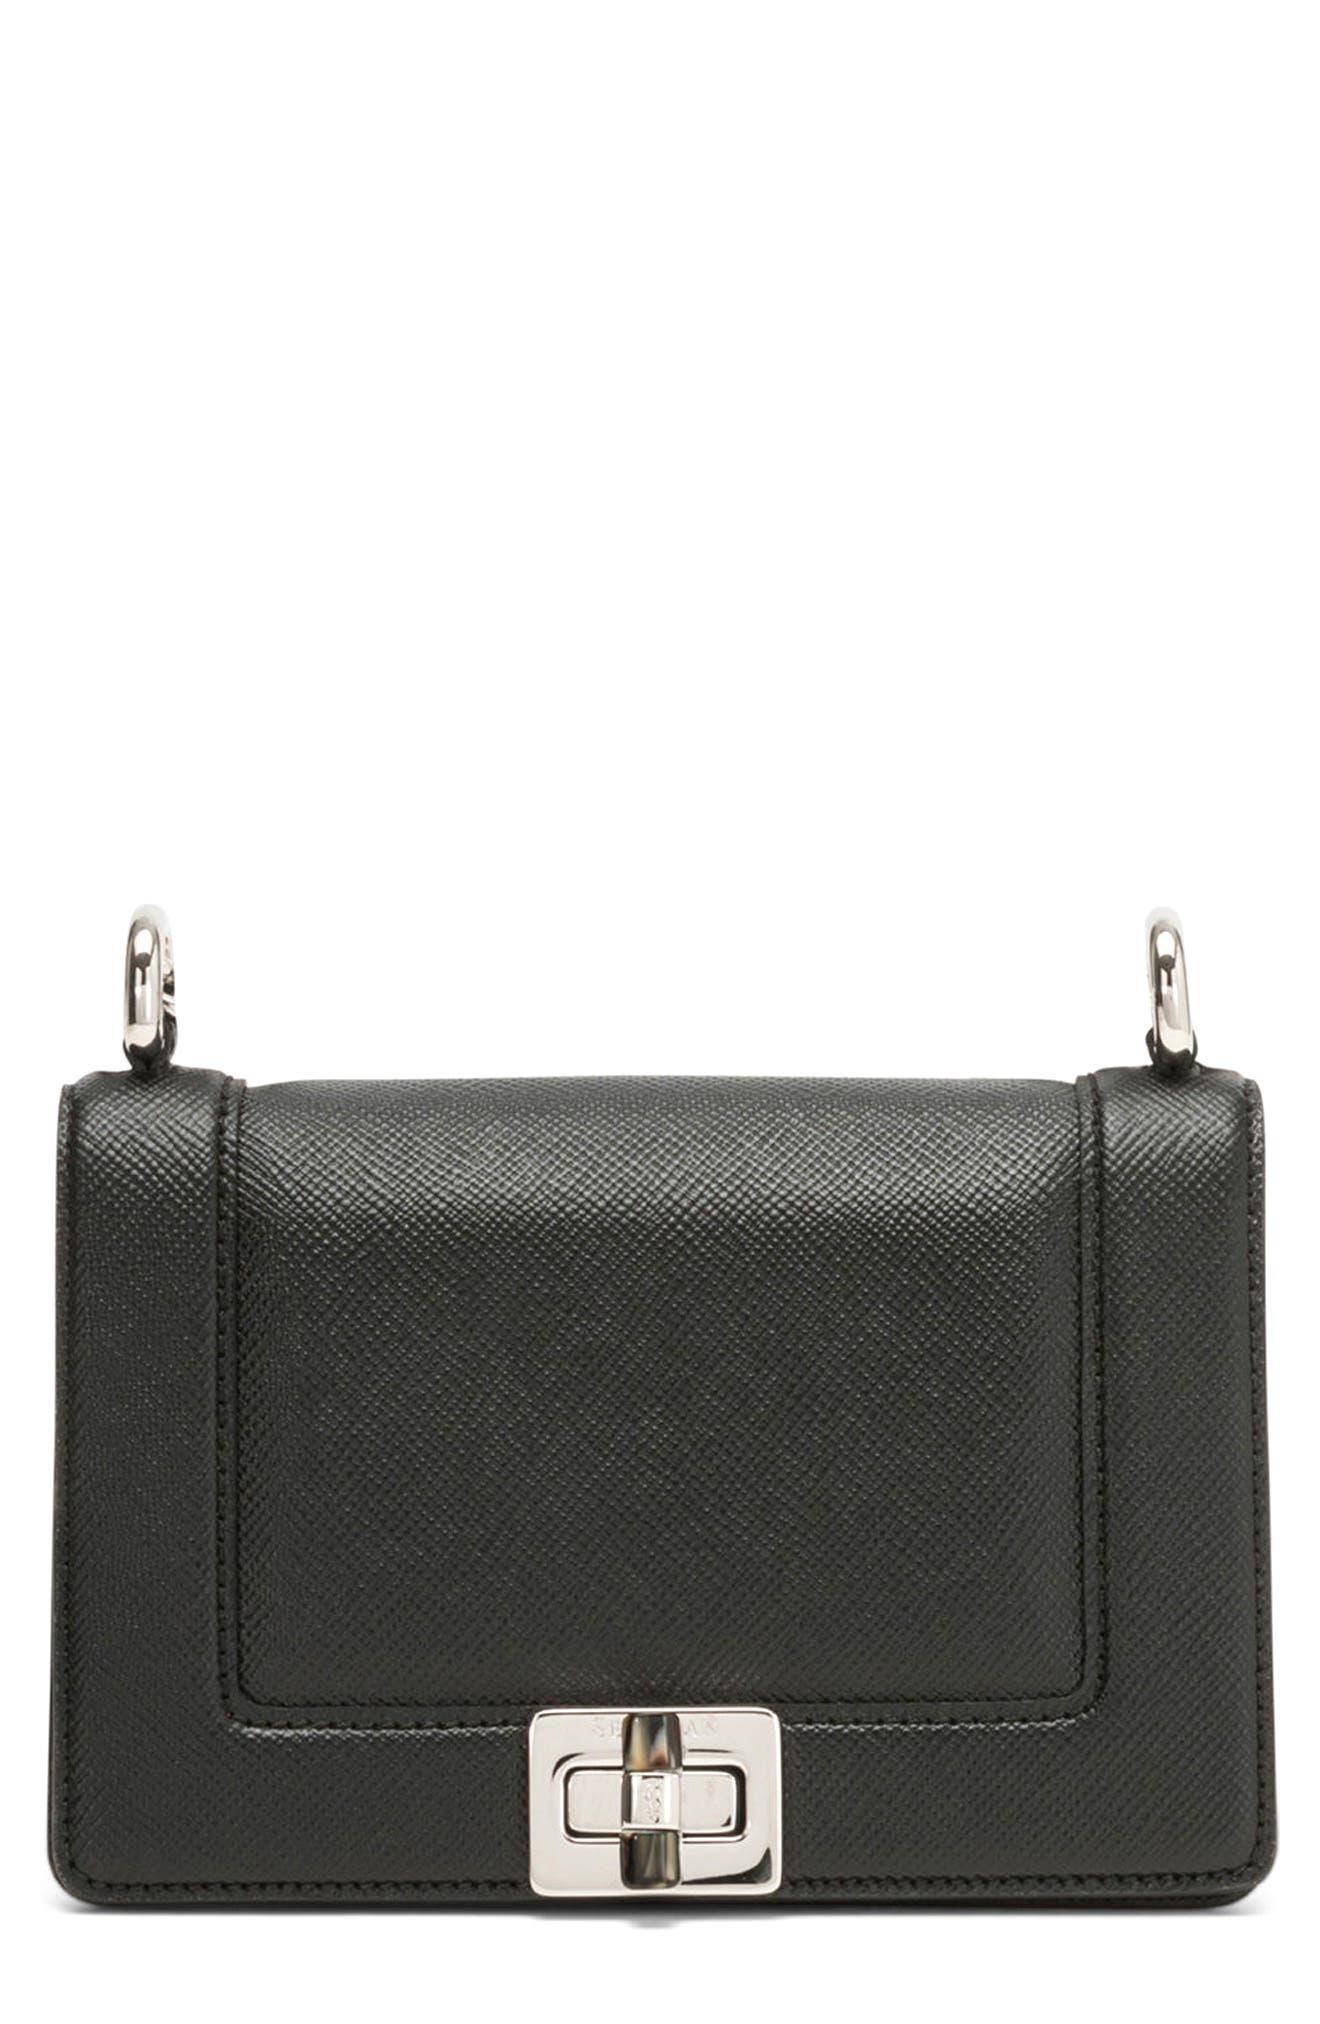 SERAPIAN MILANO Mini Roberta Evolution Leather Crossbody Bag